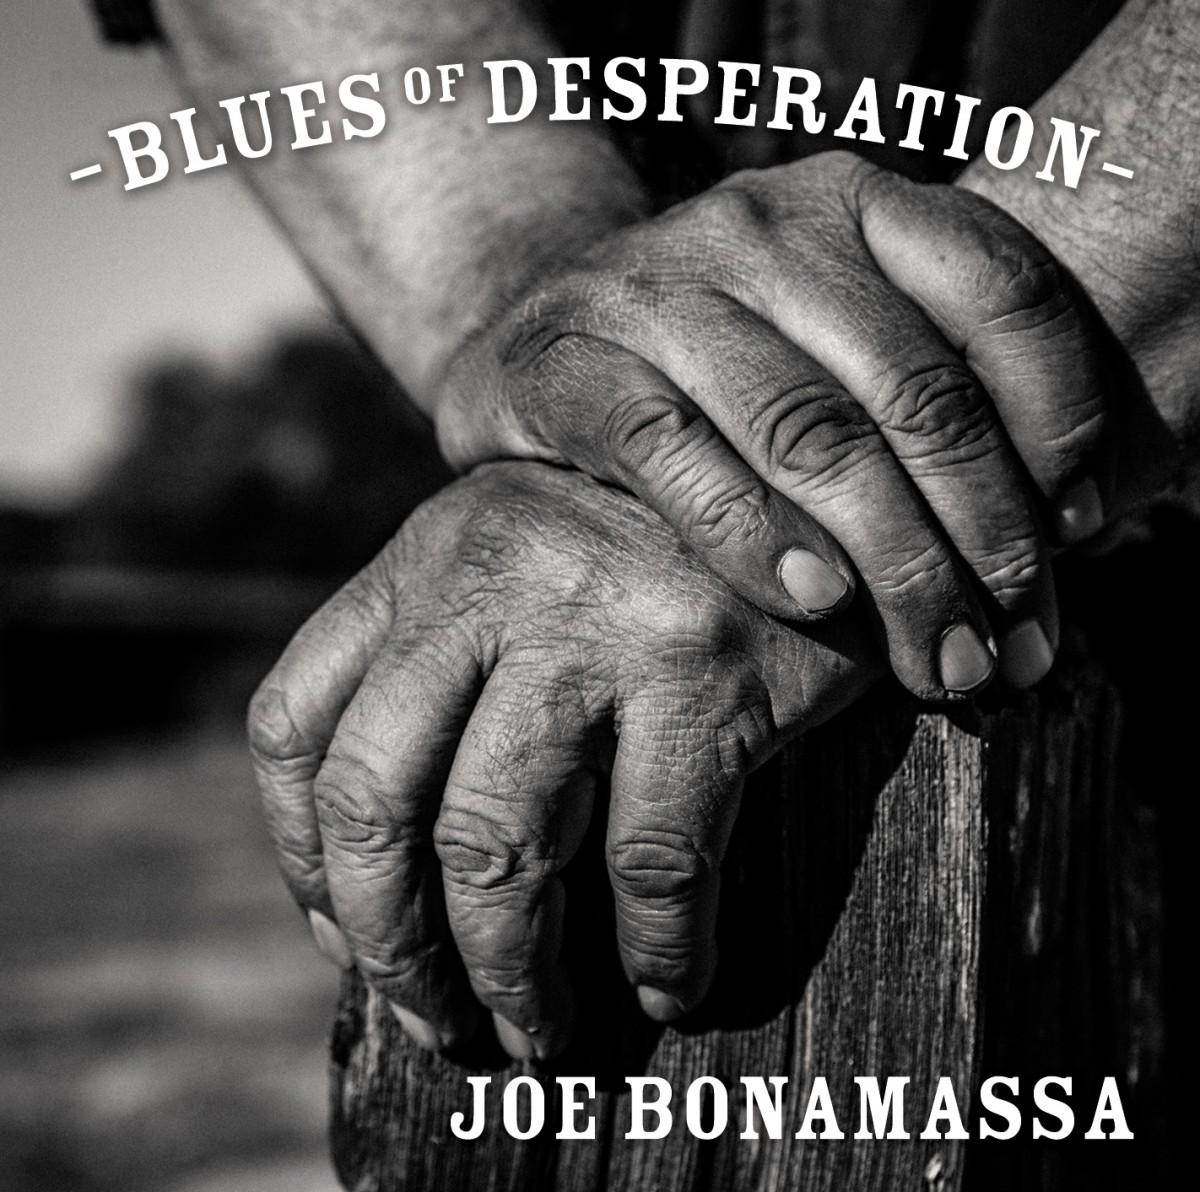 joe-bonamassa-blues-of-desperation-1200x1192